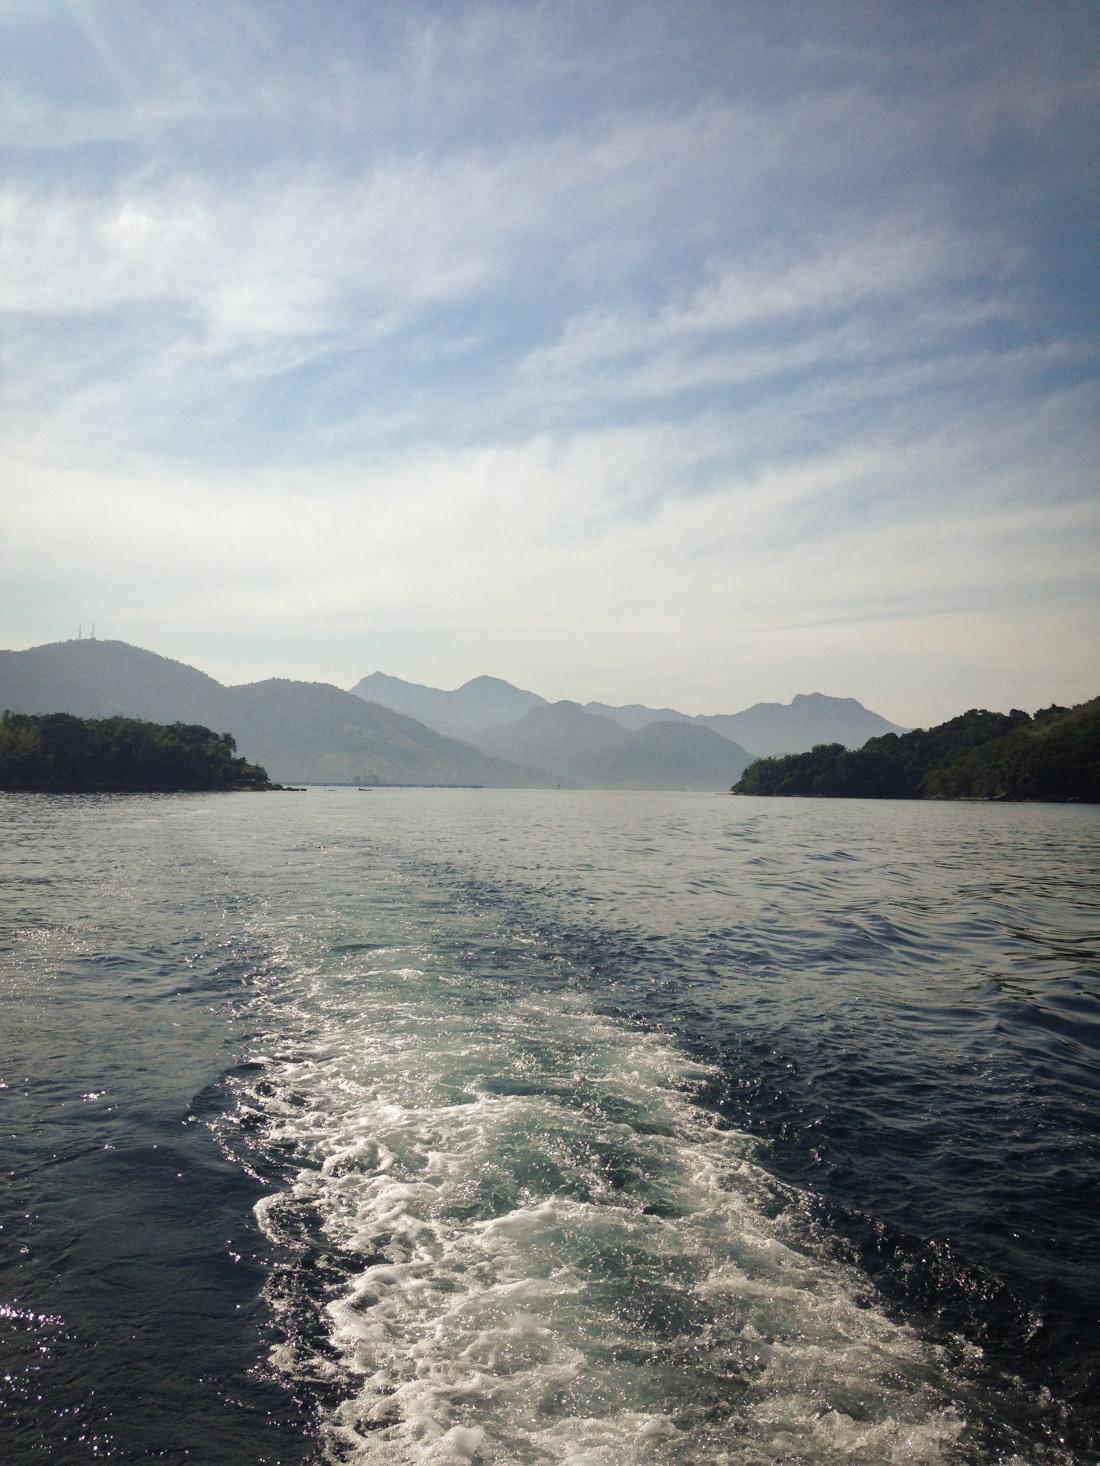 ilha-grande-rj-viagem-blog-coamotta-6